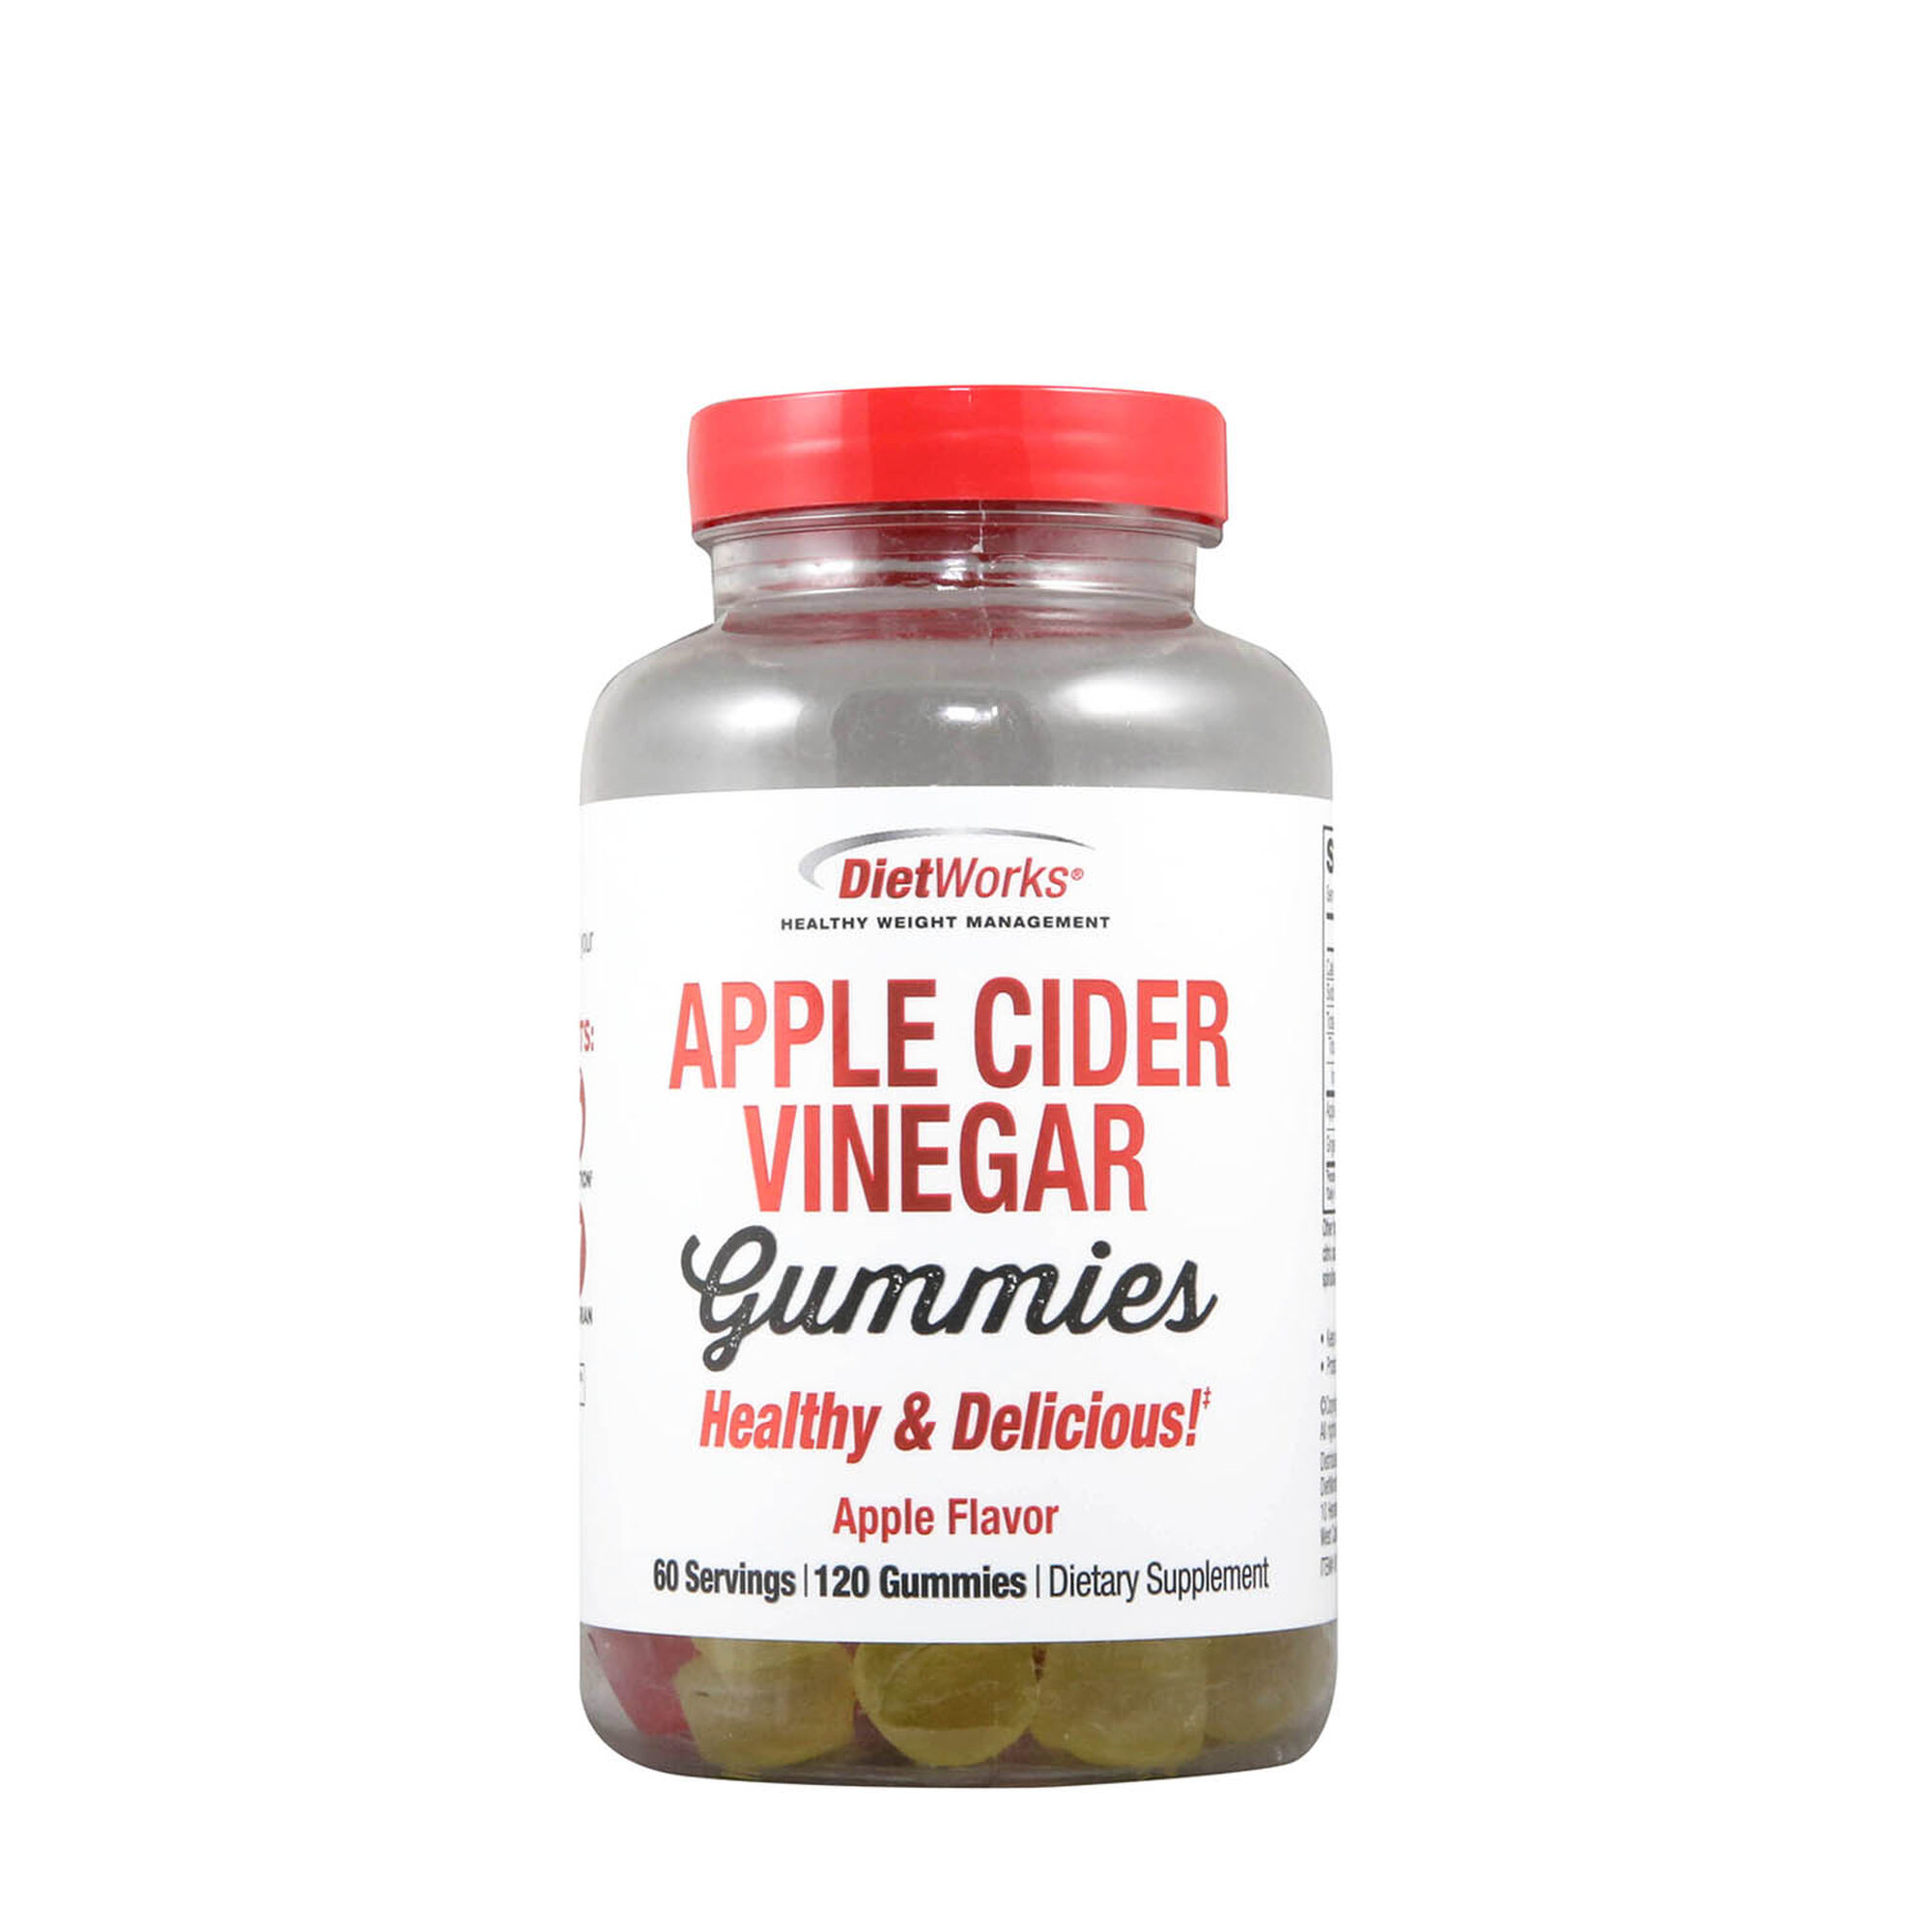 Apple Cider Vinegar Gummies For Weight Loss, Healthy Detox